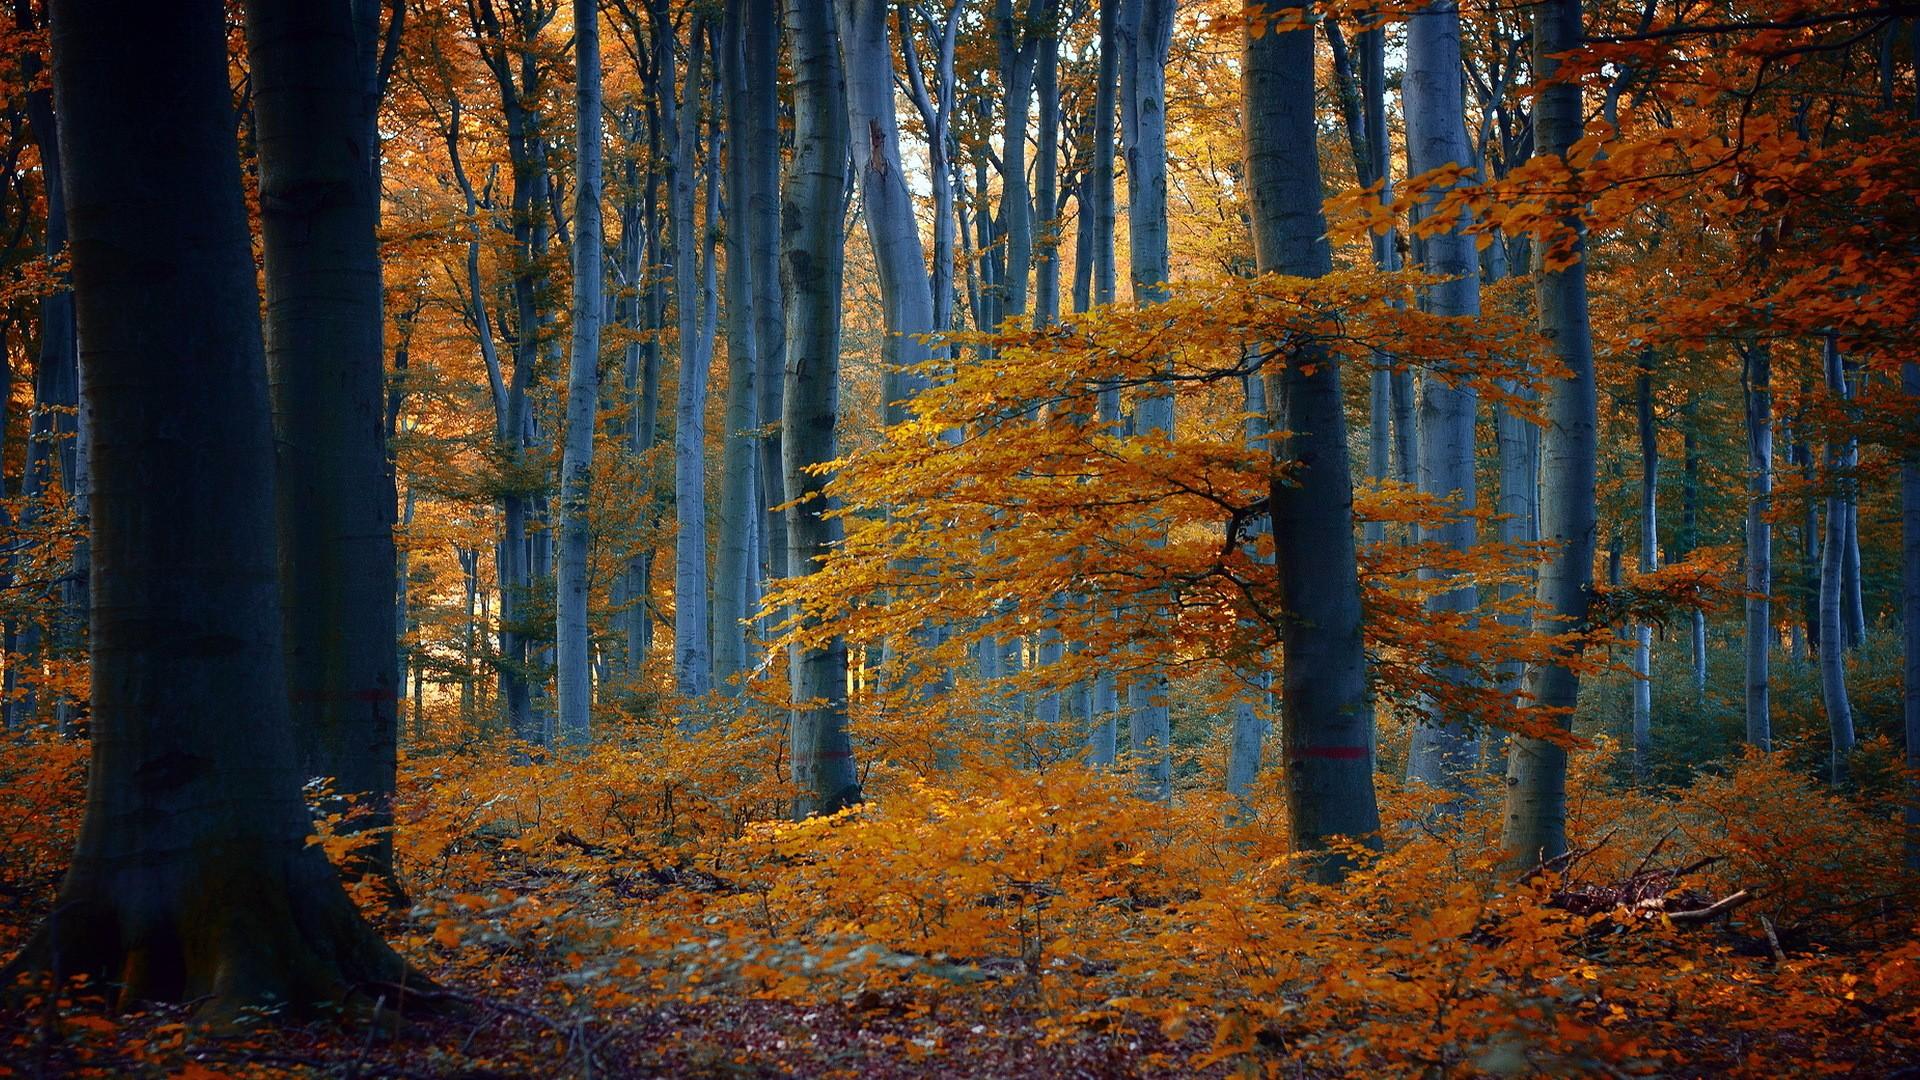 осенний лес фото картинки на рабочий стол вот